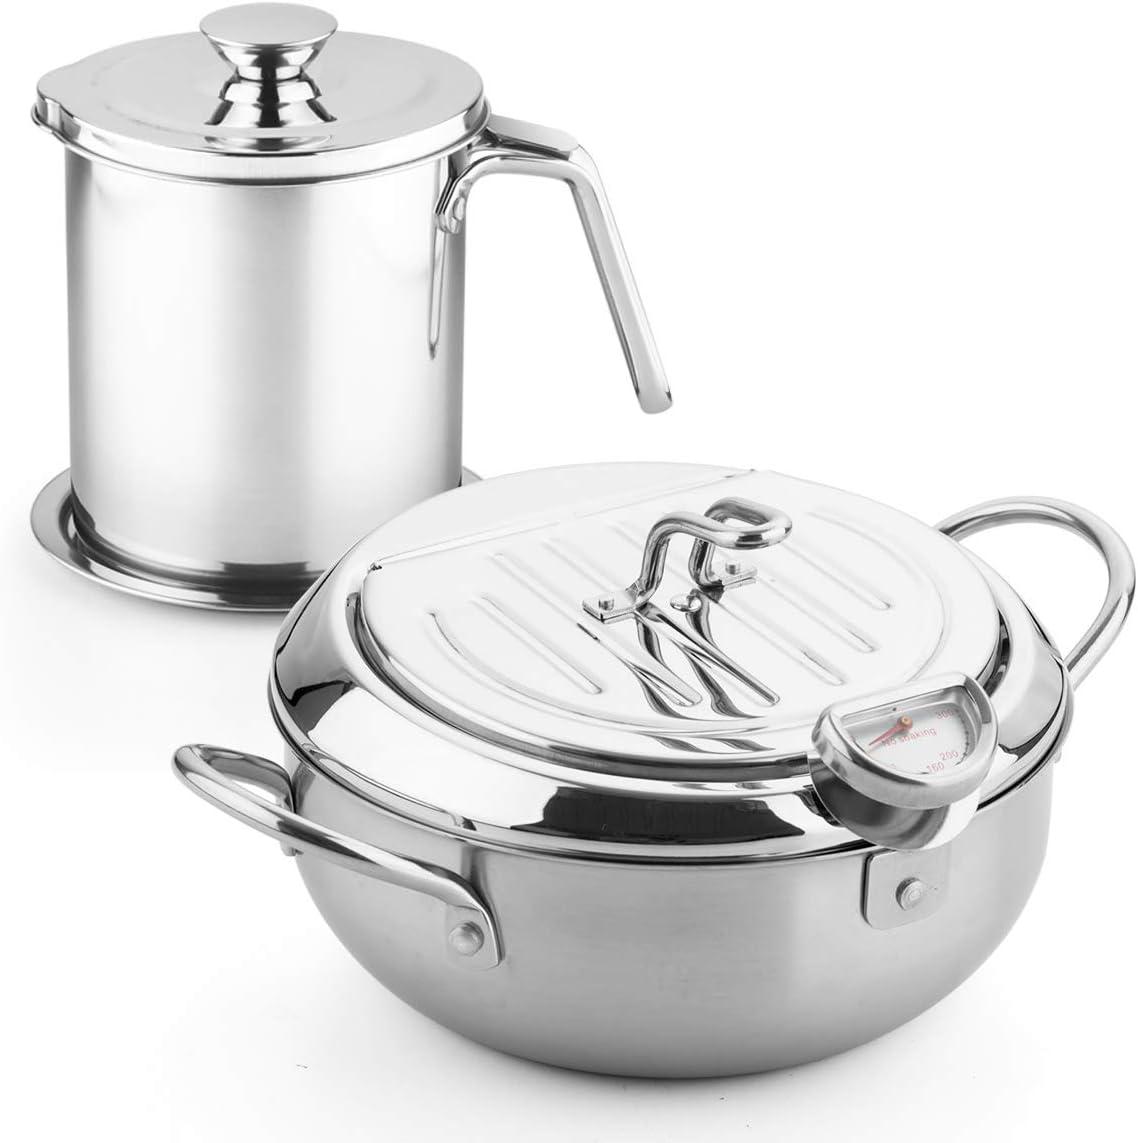 9.8 * 6in 3.38Quart /& 1.7L Filter pot with Filter Spoon stainless steel fryer pan Tempura Japanese Style Household Frying Pot Kitchen Deep Fryers Tempura Fryer Pan PFOA free